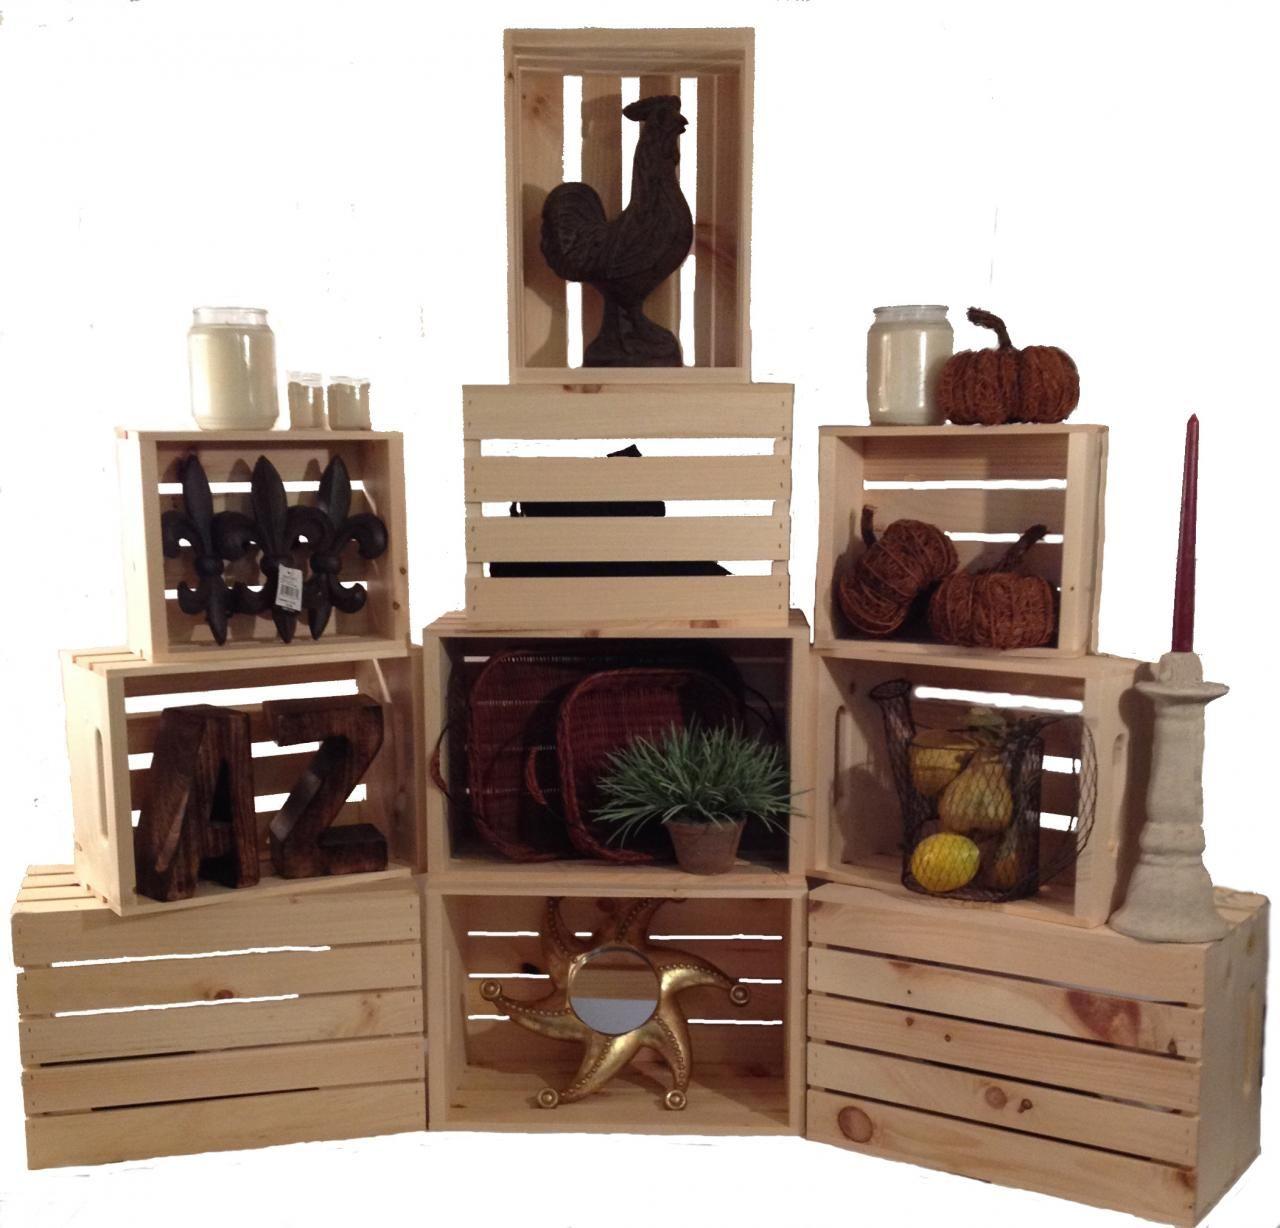 rustic stacking crates wood retail display homegoods. Black Bedroom Furniture Sets. Home Design Ideas